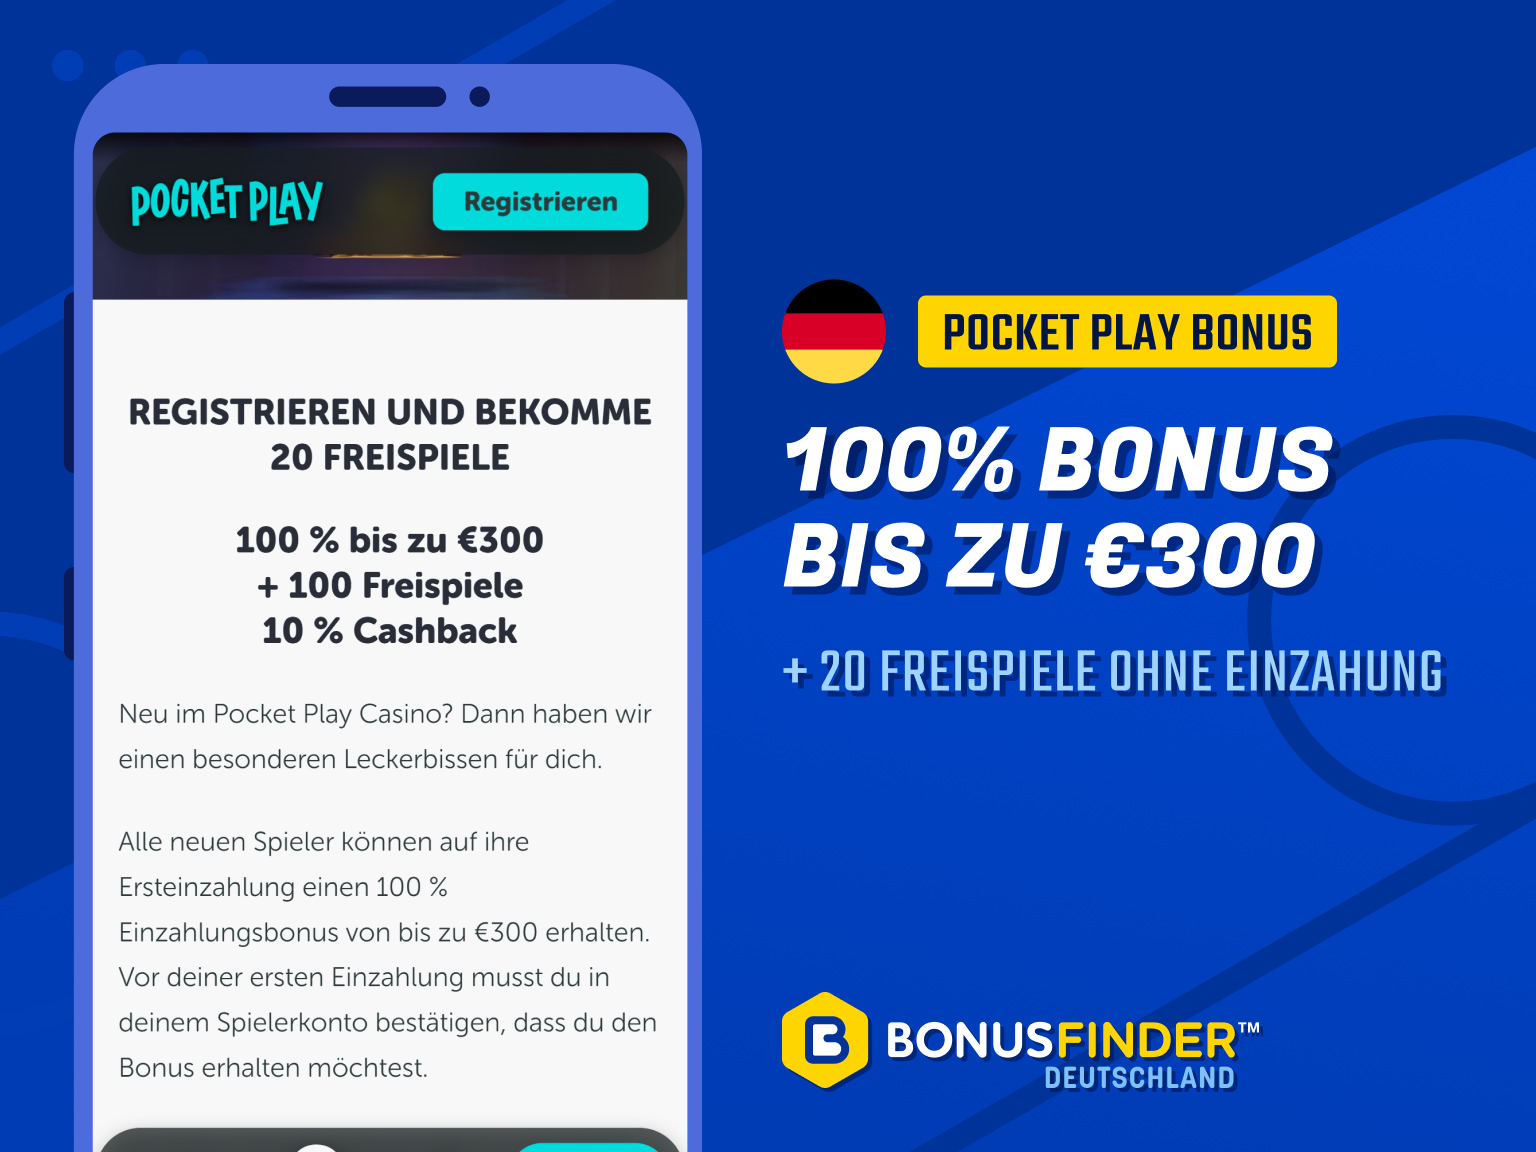 pocket play no deposit bonus